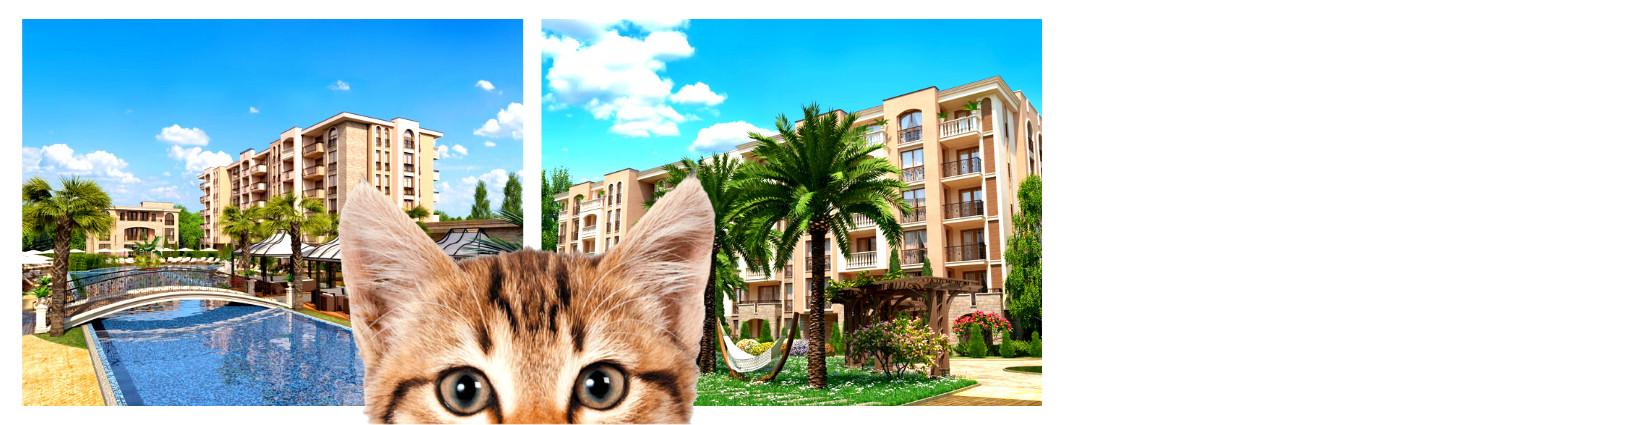 Апартаменты в комплексах<br> от 14 225 евро в 50 метрах от моря